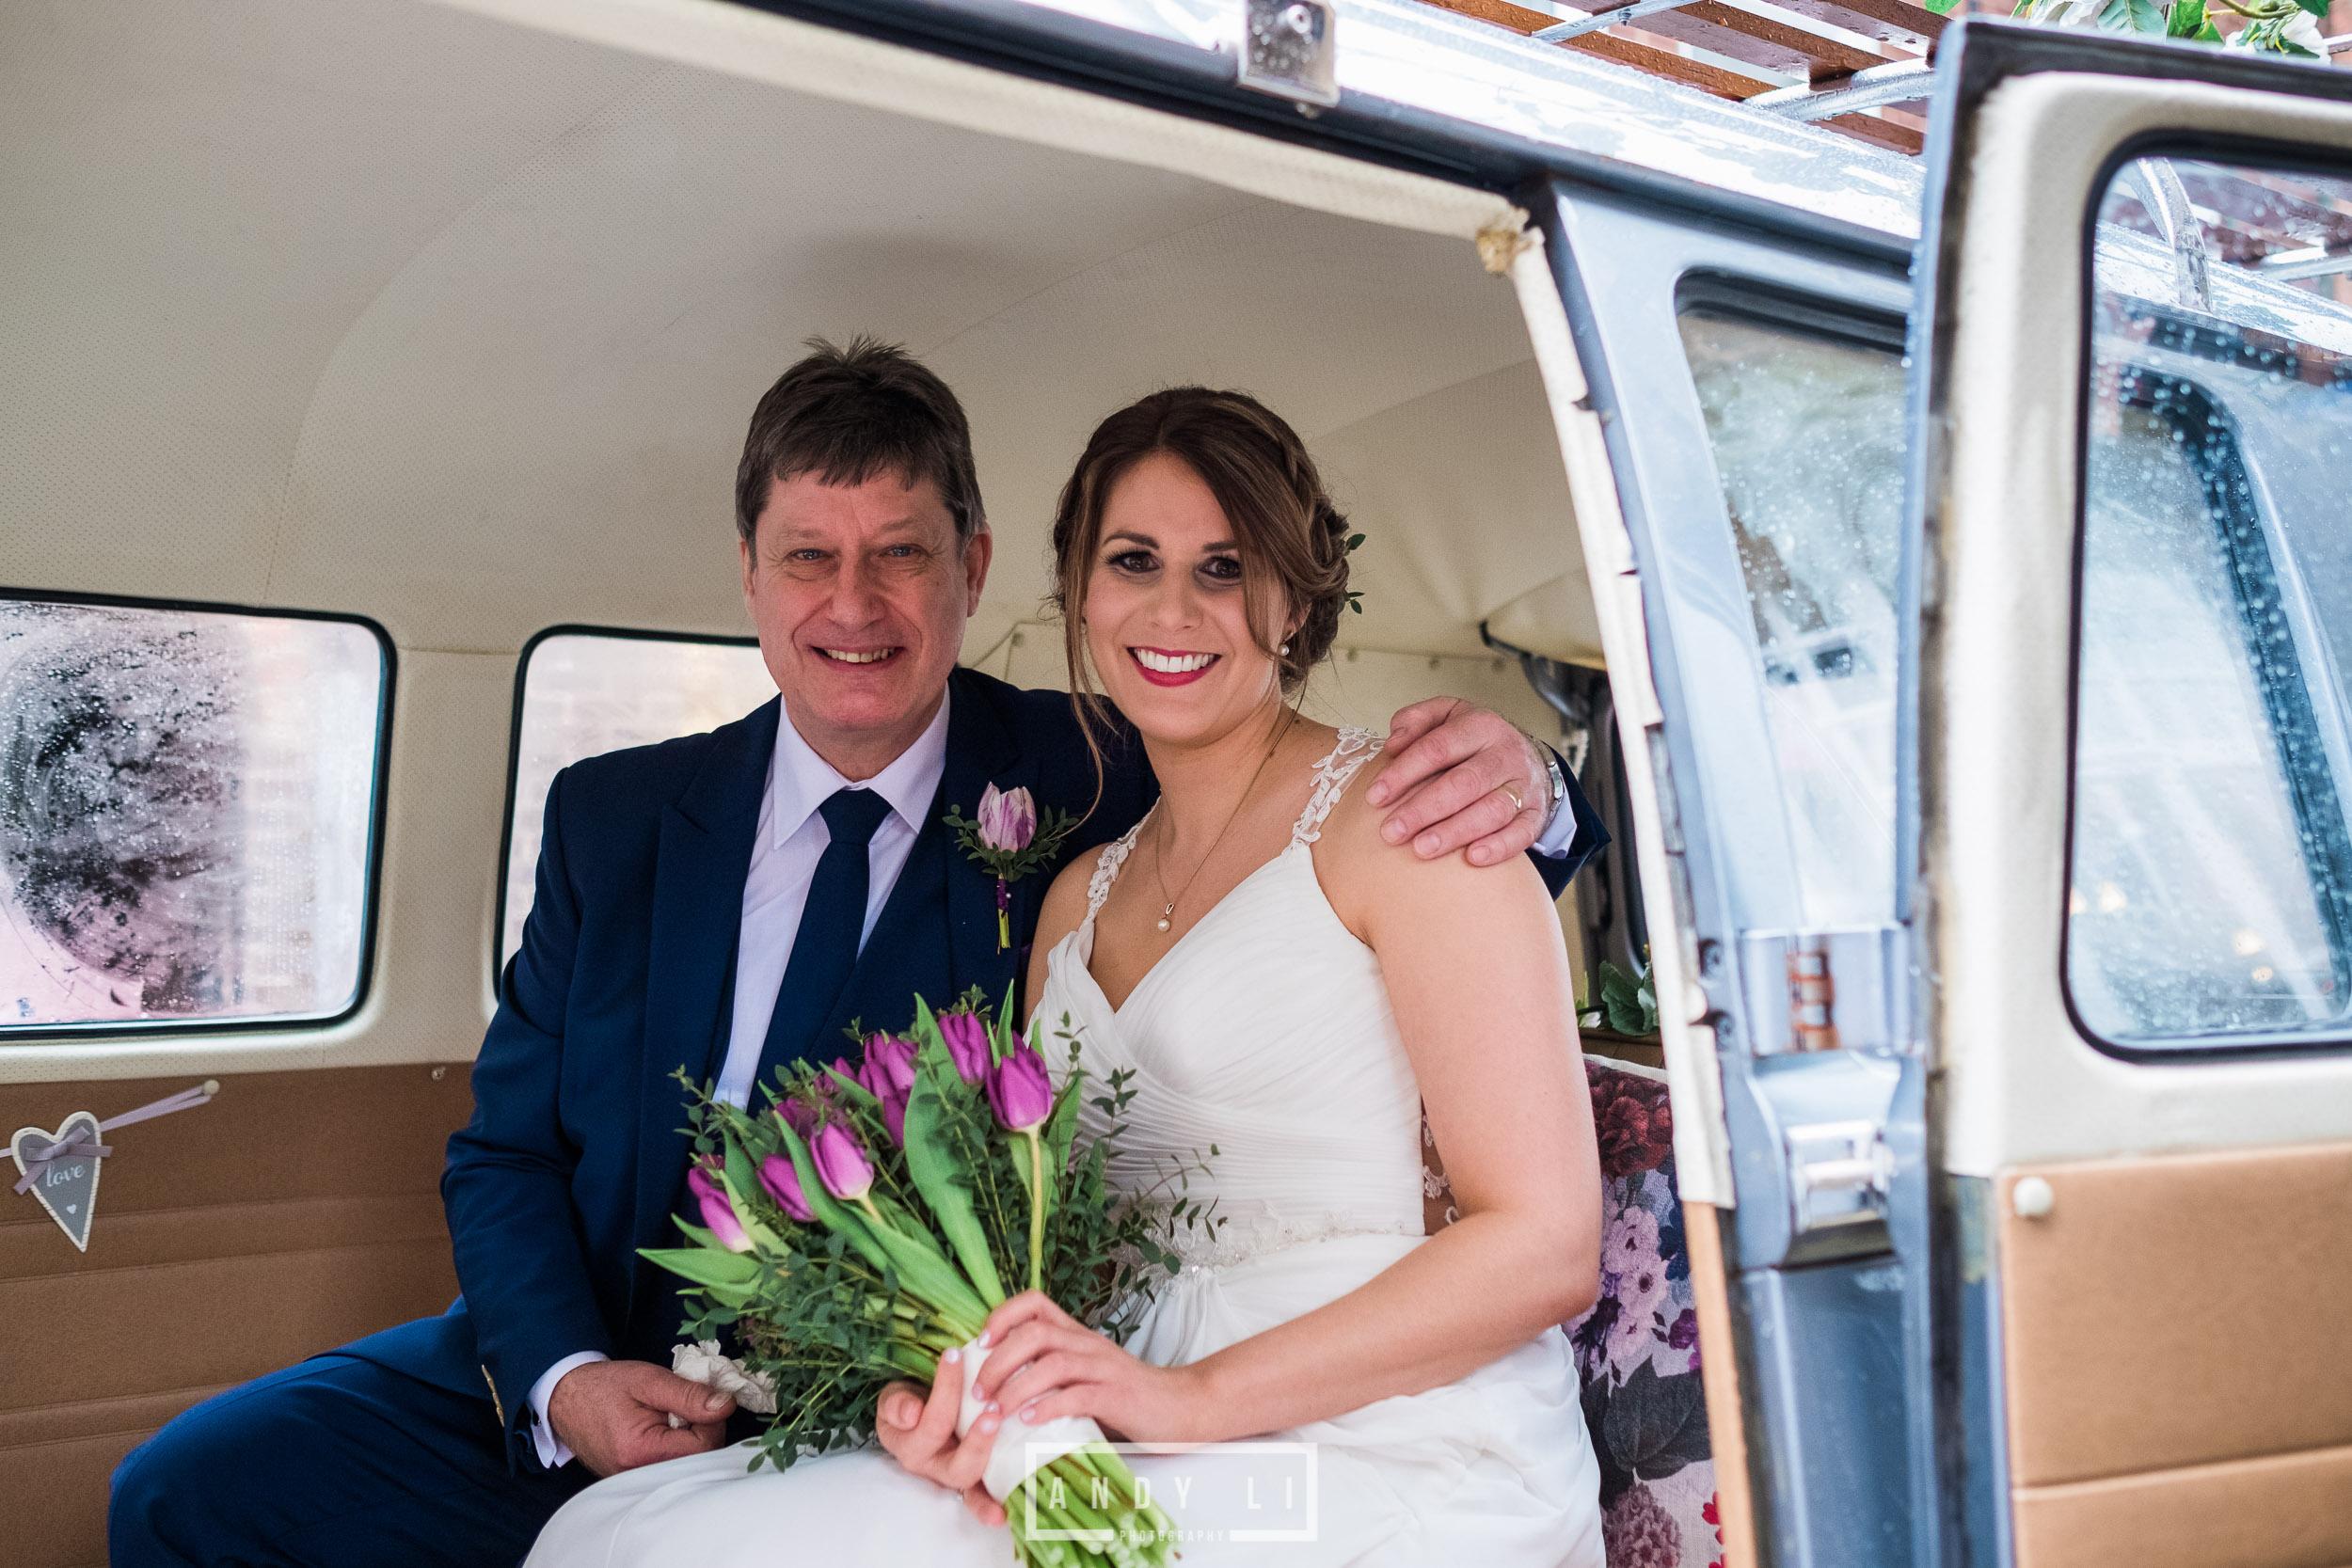 Belle Epoque Wedding Photographer-011-DSCF6888.jpg